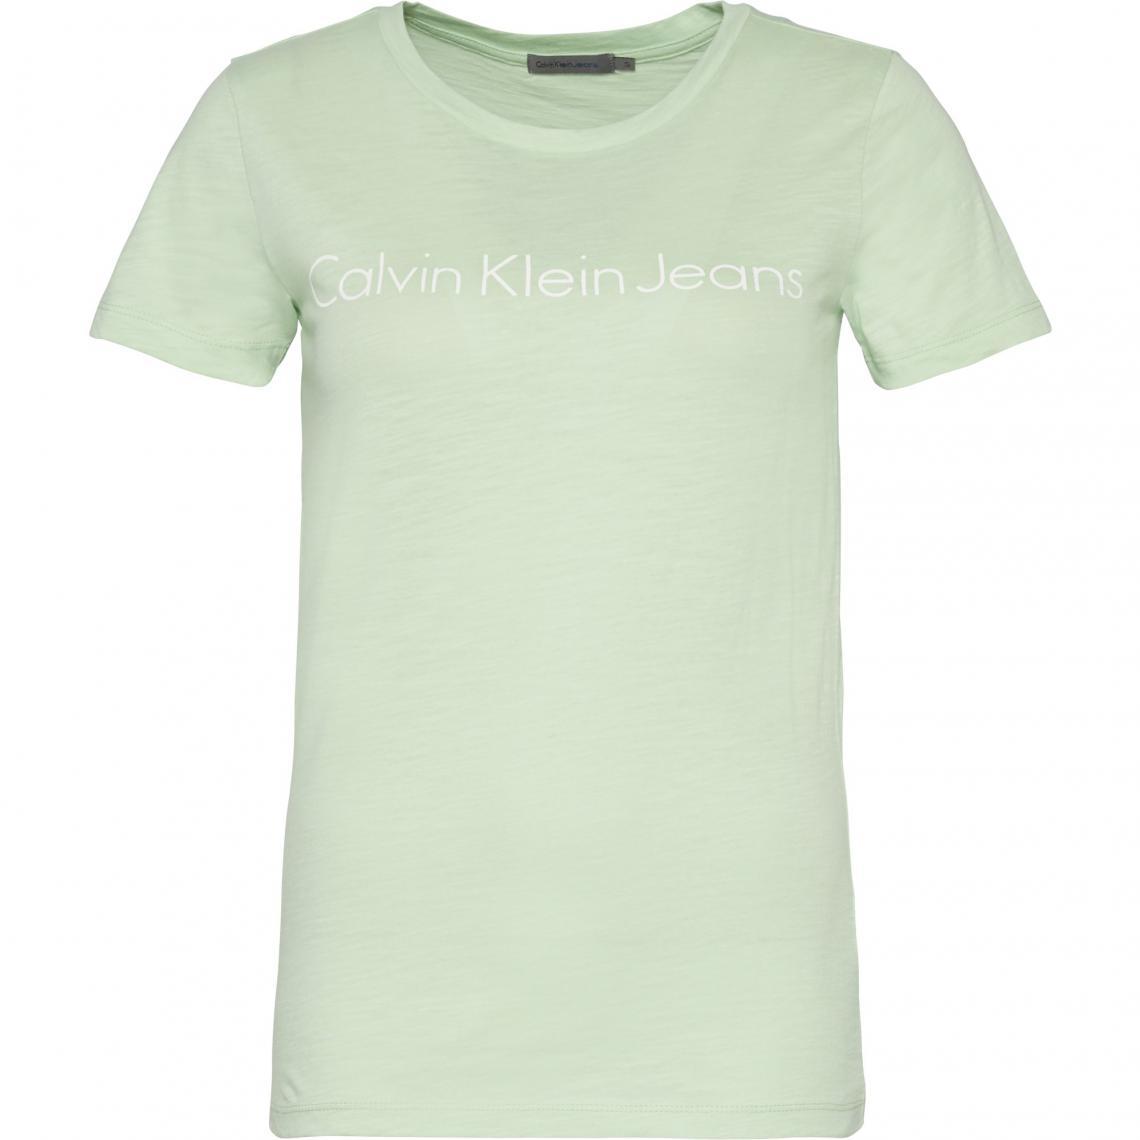 Tee-shirt manches courtes femme Calvin Klein - Vert Calvin Klein Femme 4d0008f58a0